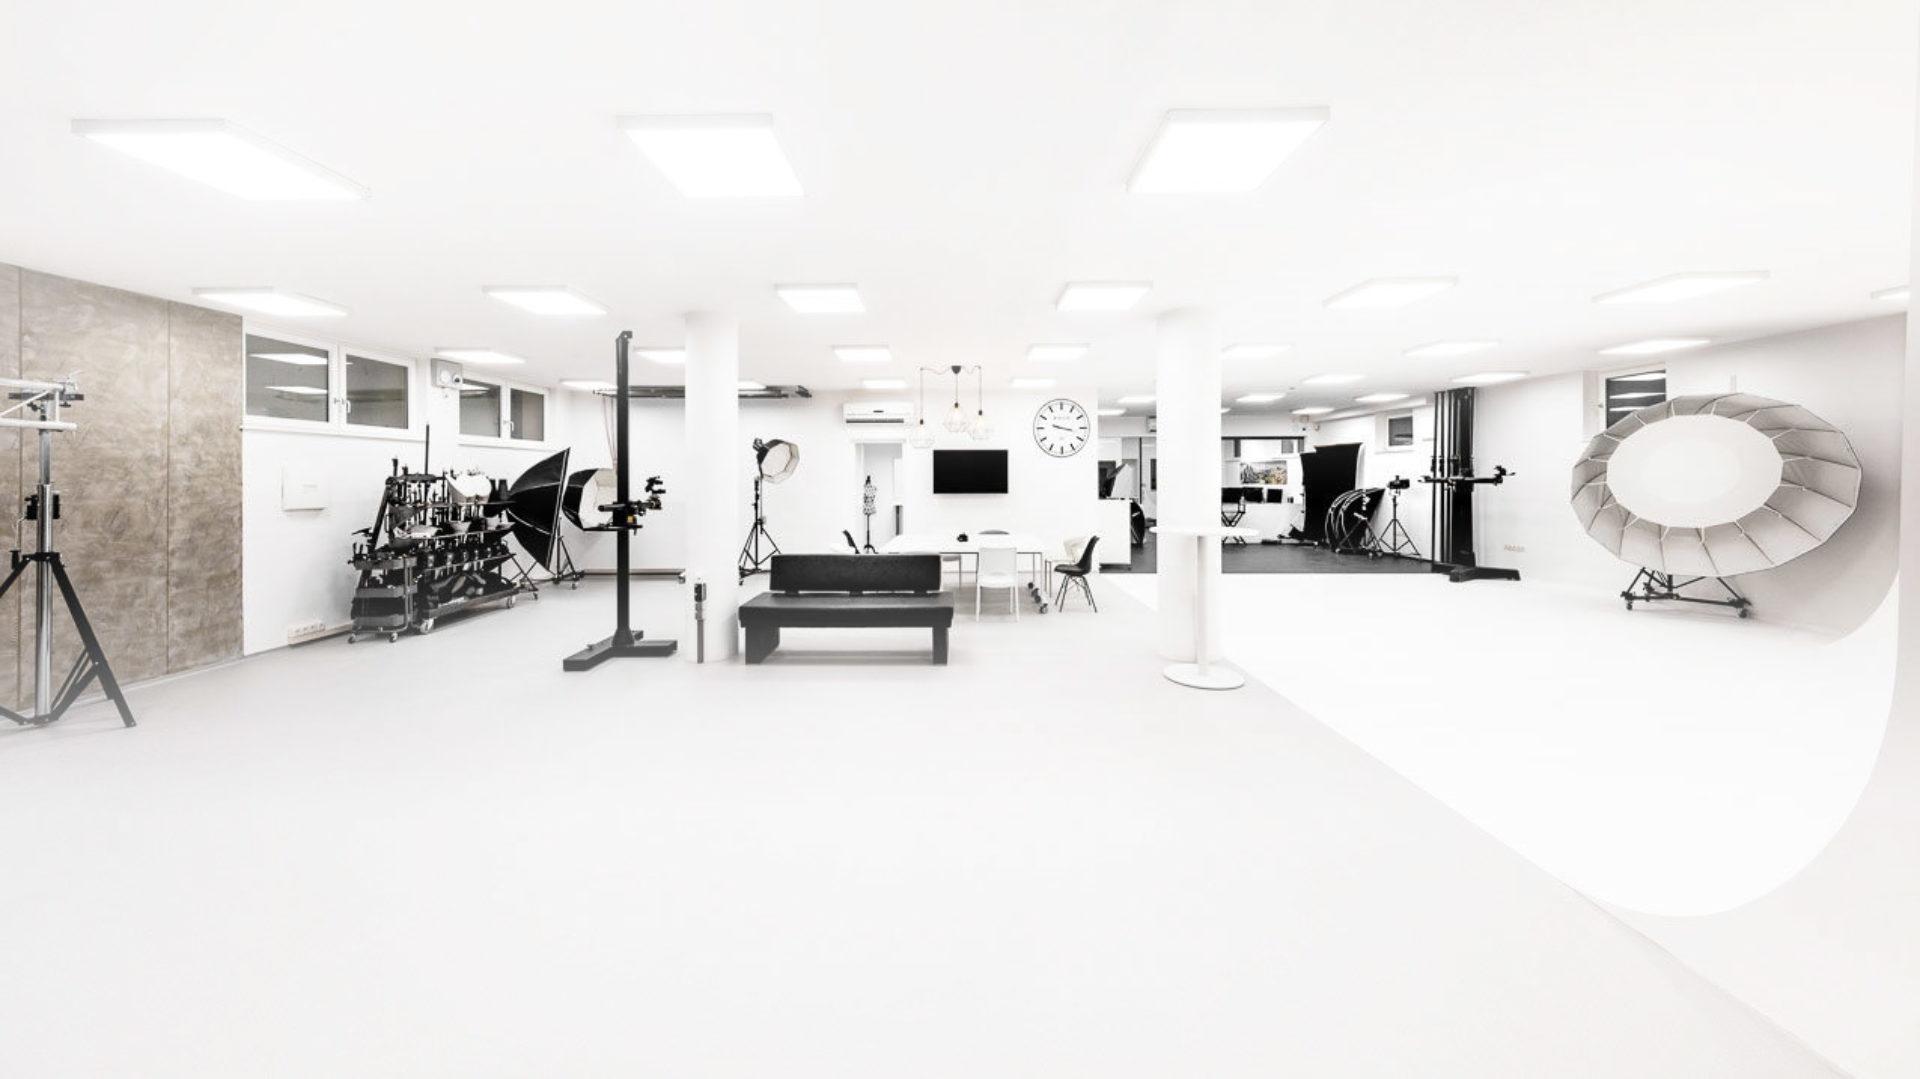 studio-suedtirol.com